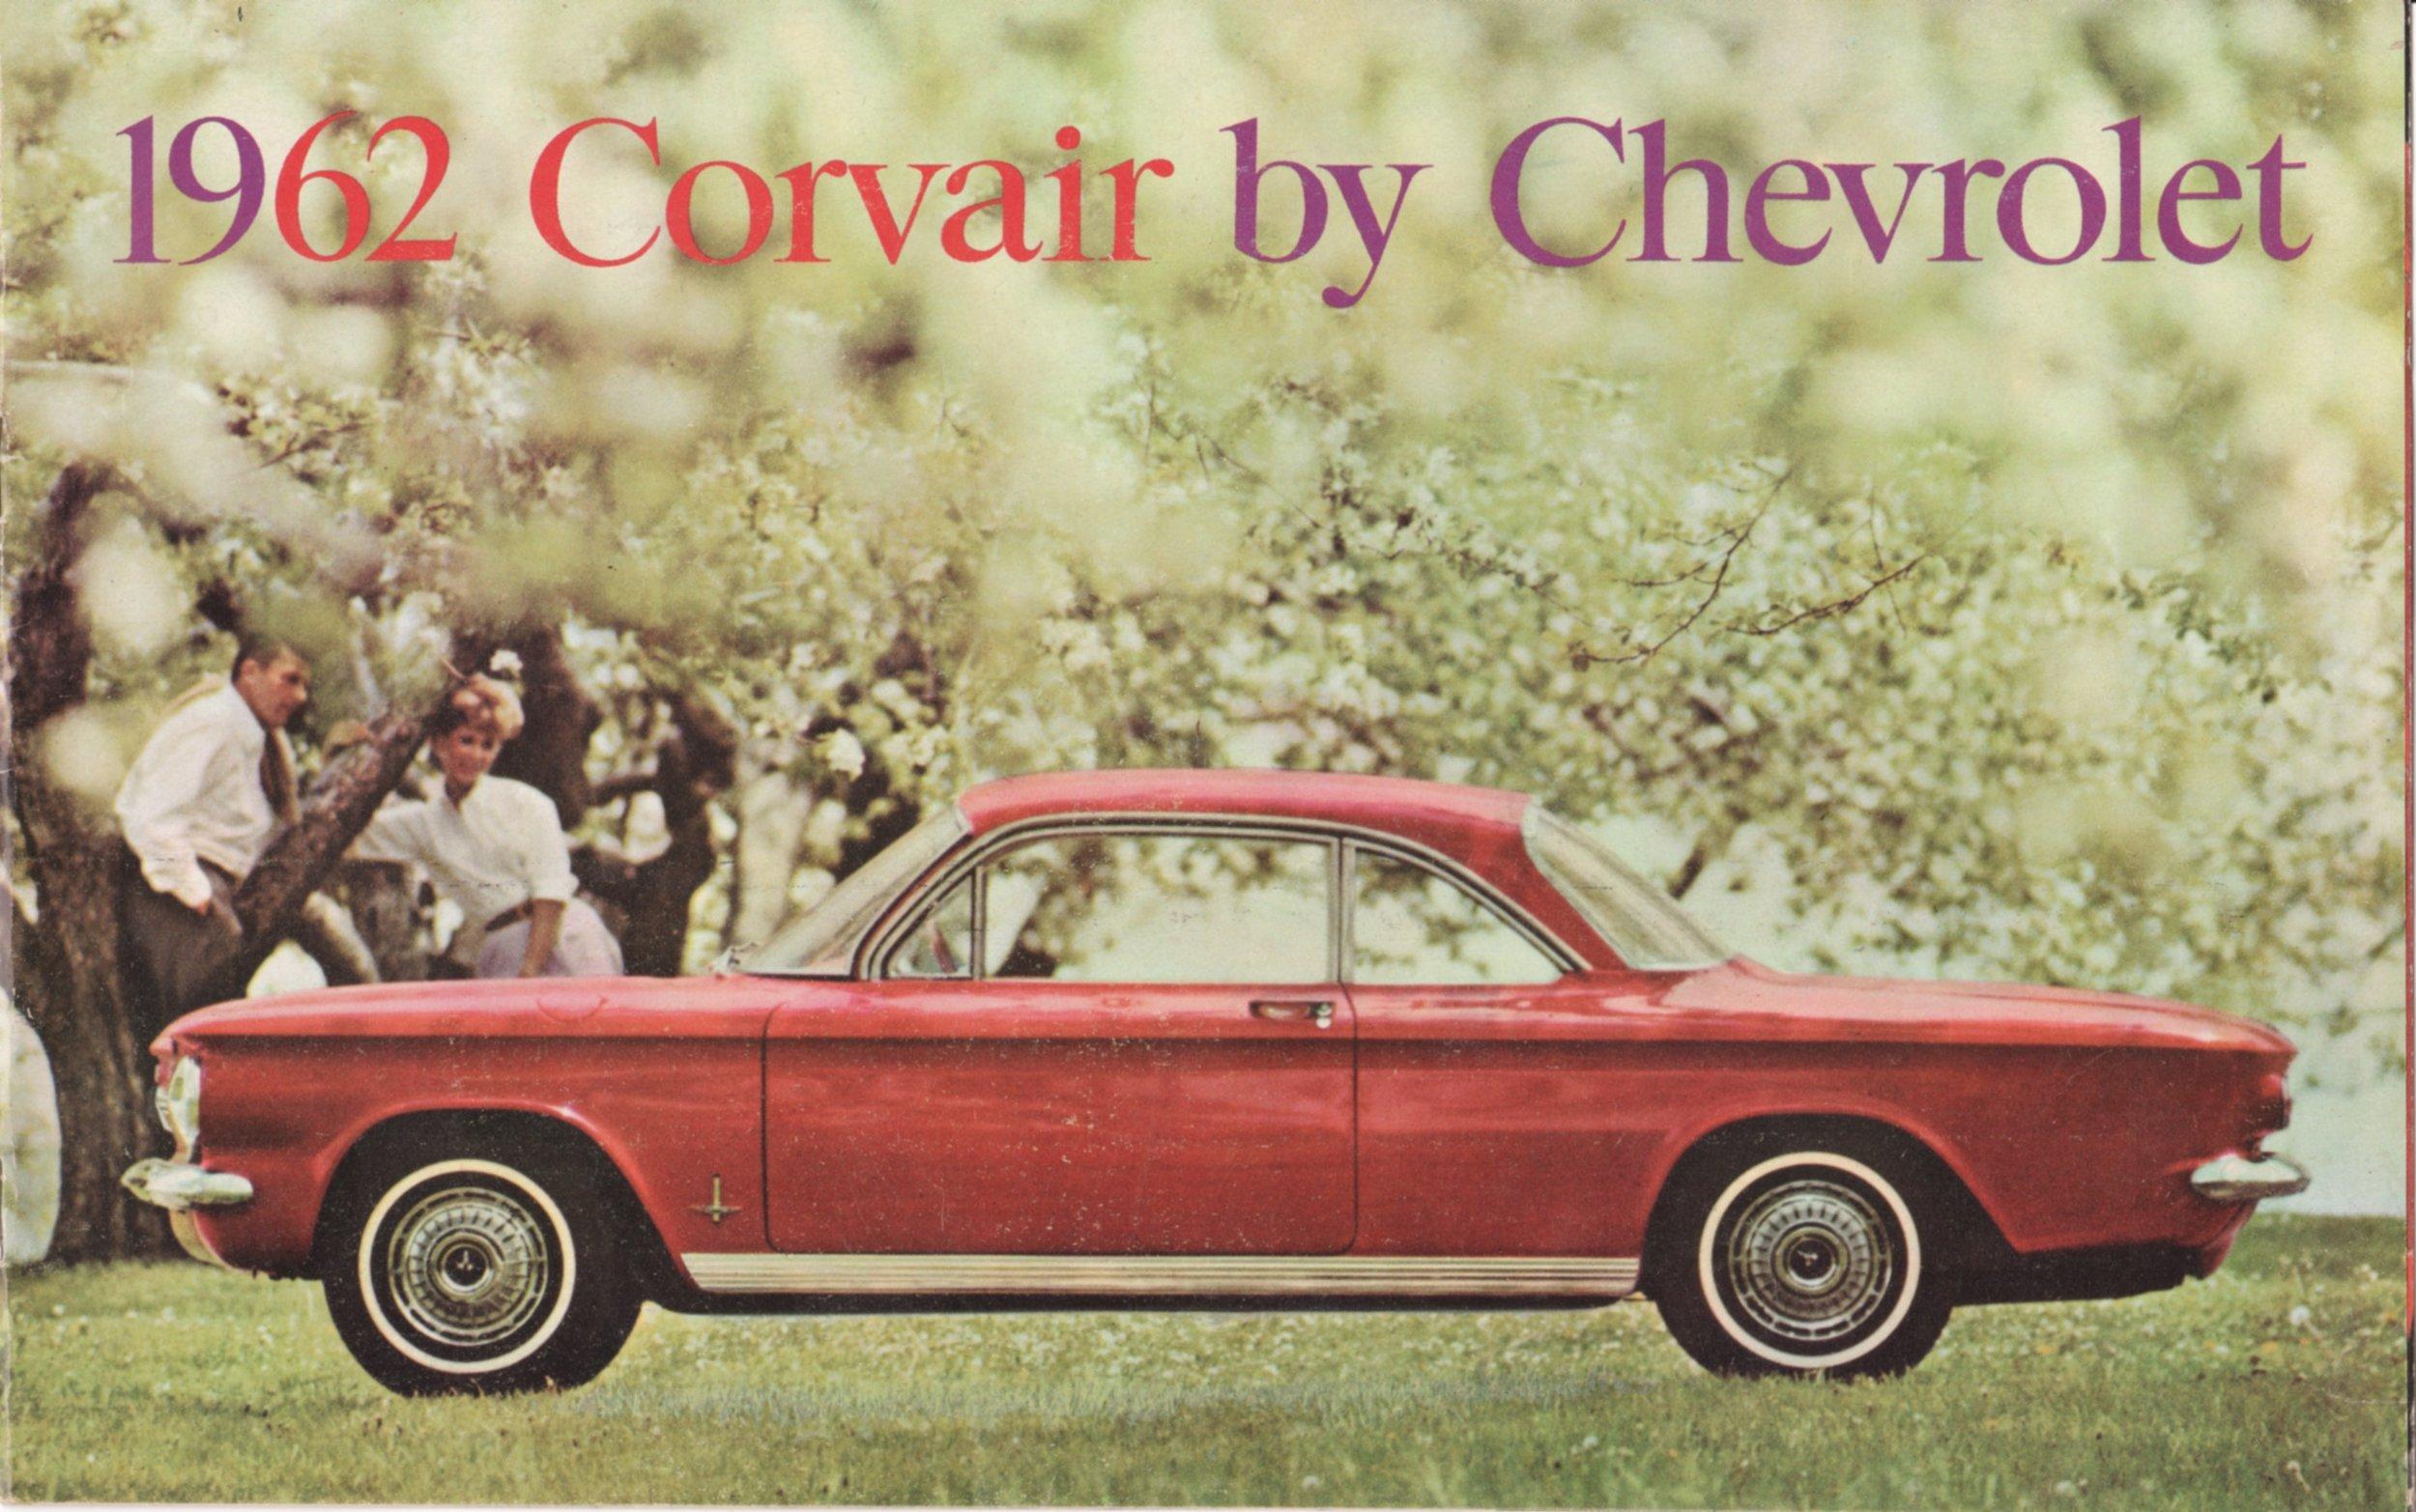 Corvair 1962.jpeg